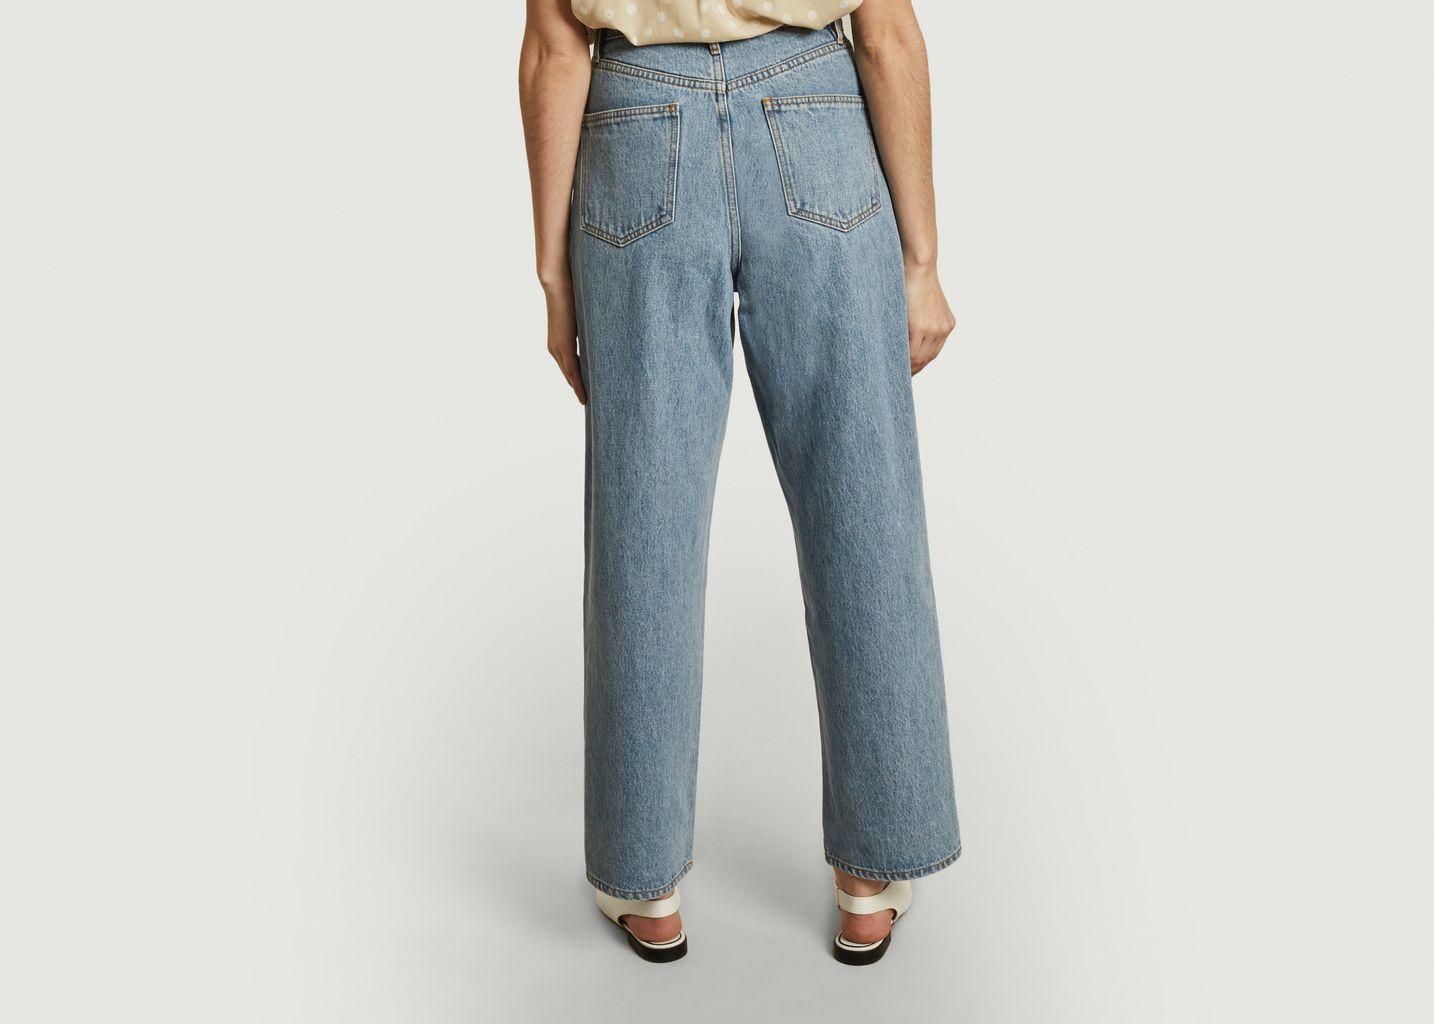 Jeans Peggy - Bellerose